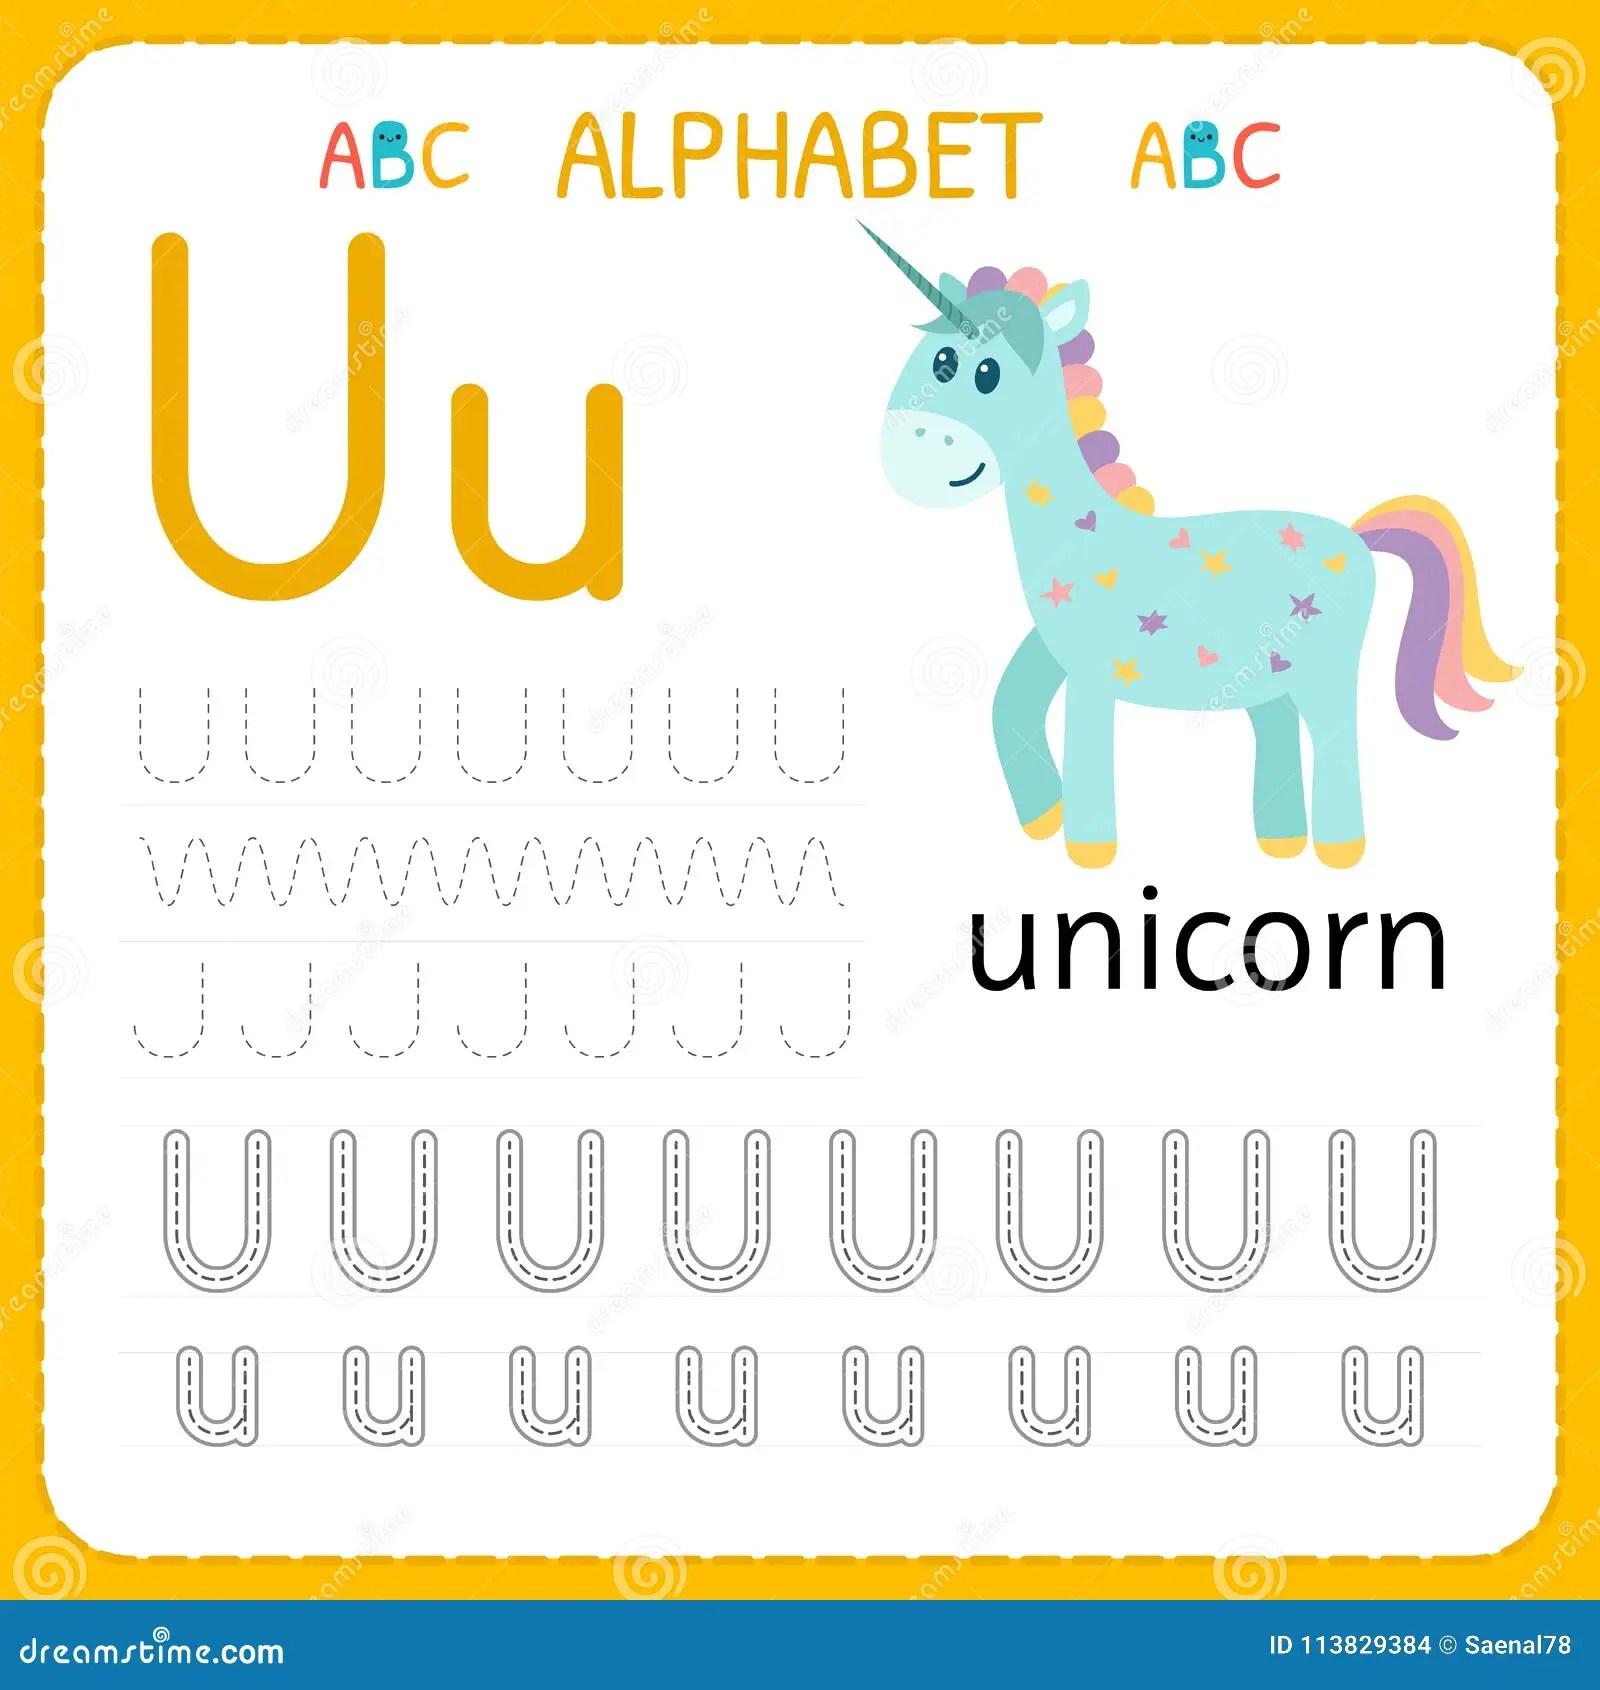 Alphabet Tracing Worksheet For Preschool And Kindergarten Writing Practice Letter U Exercises